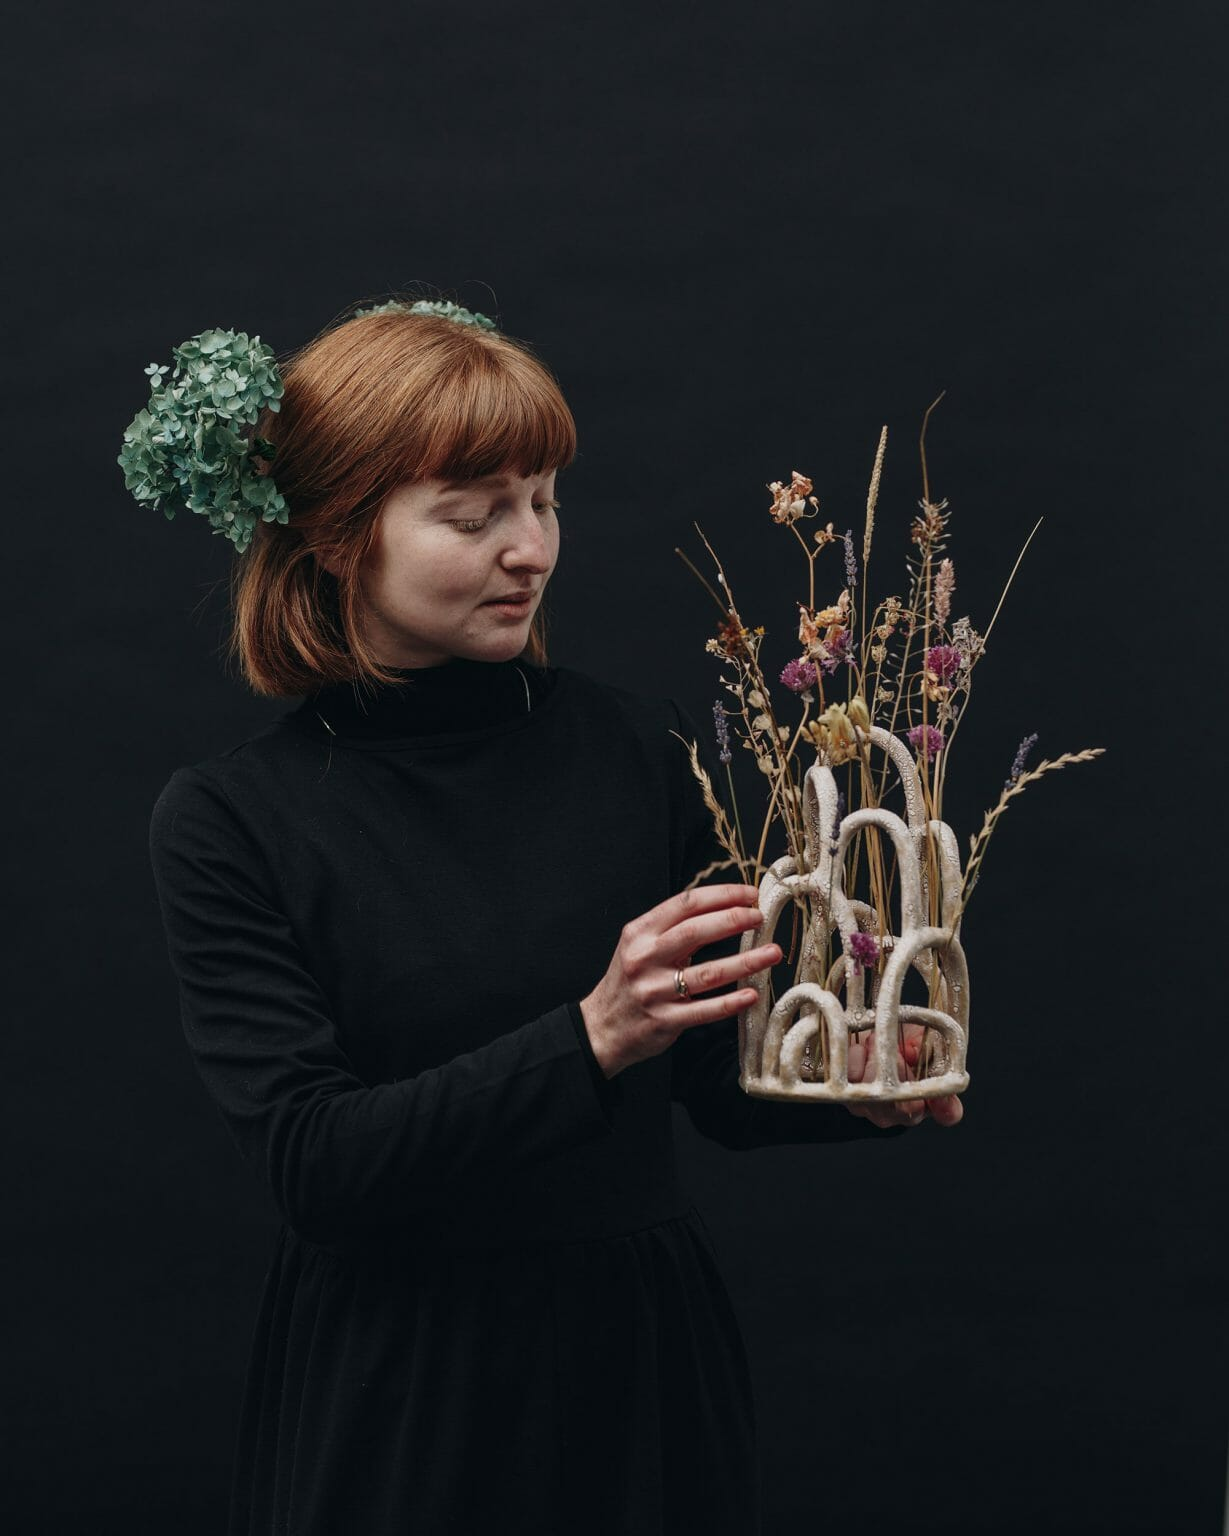 the-mountain-budvase-ceramics-plants-homeware-decoration-objects-sculpture